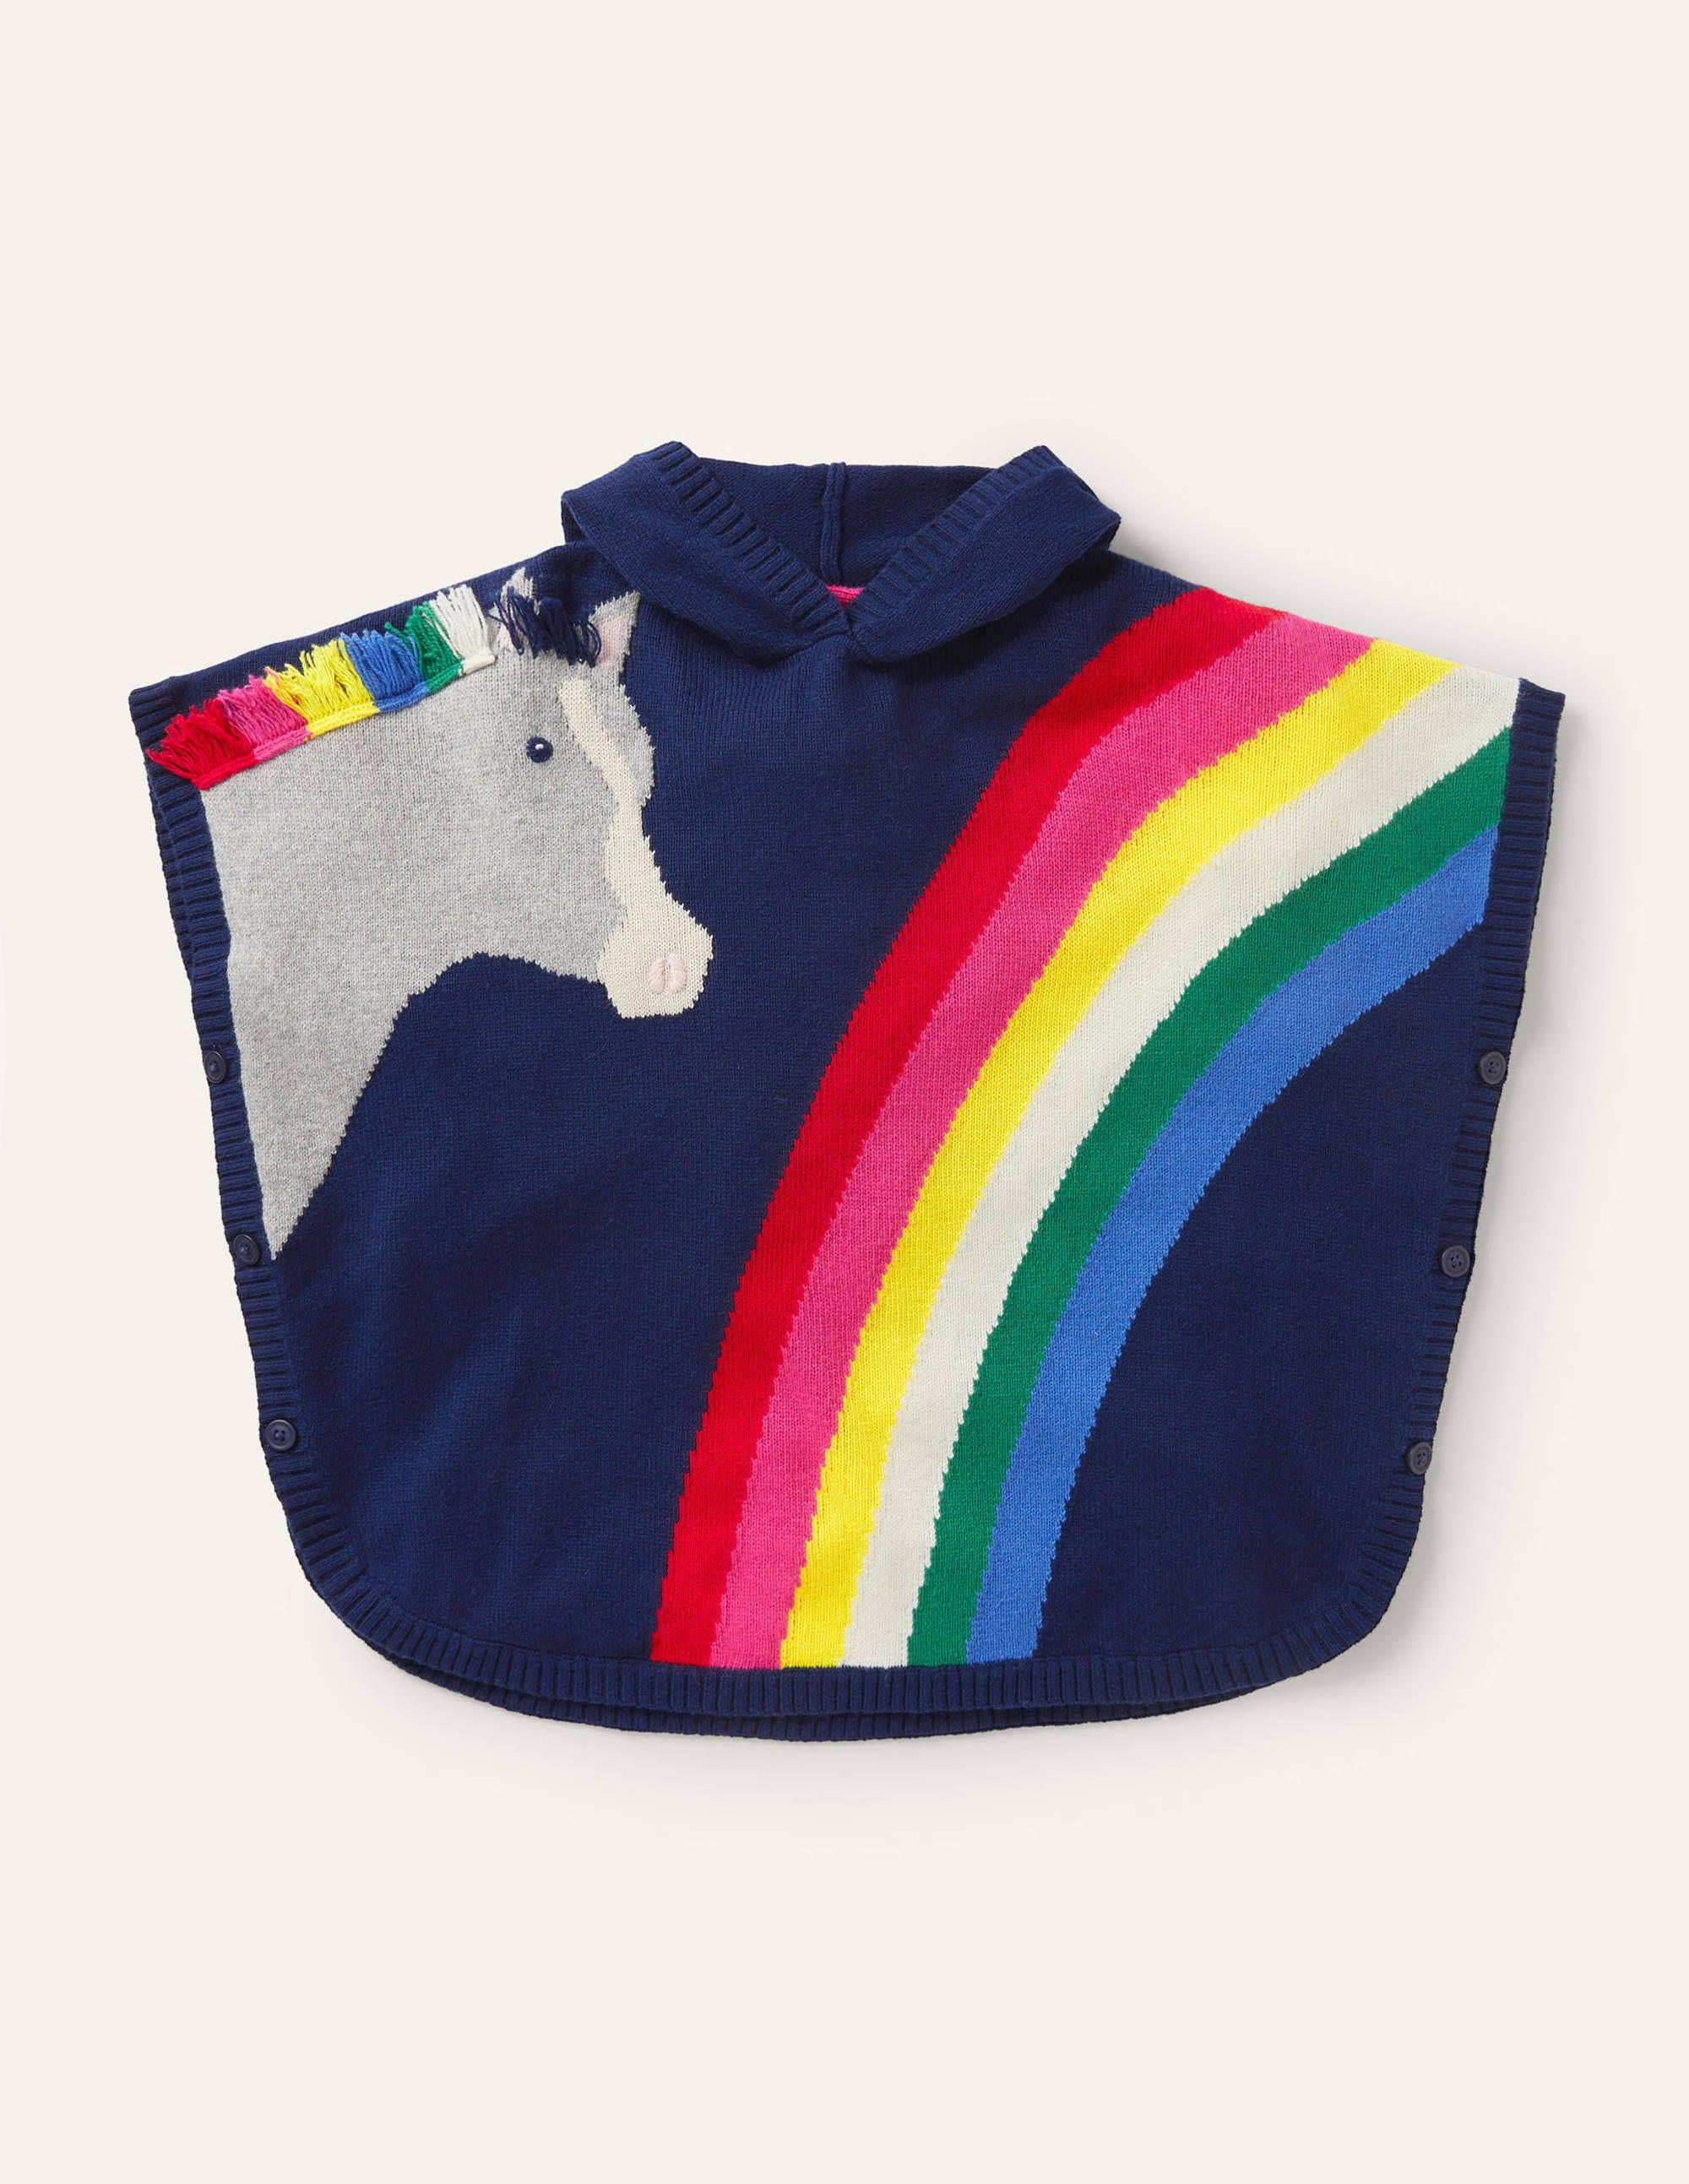 Poncho en maille à motif cheval BLU Boden Boden, Blue